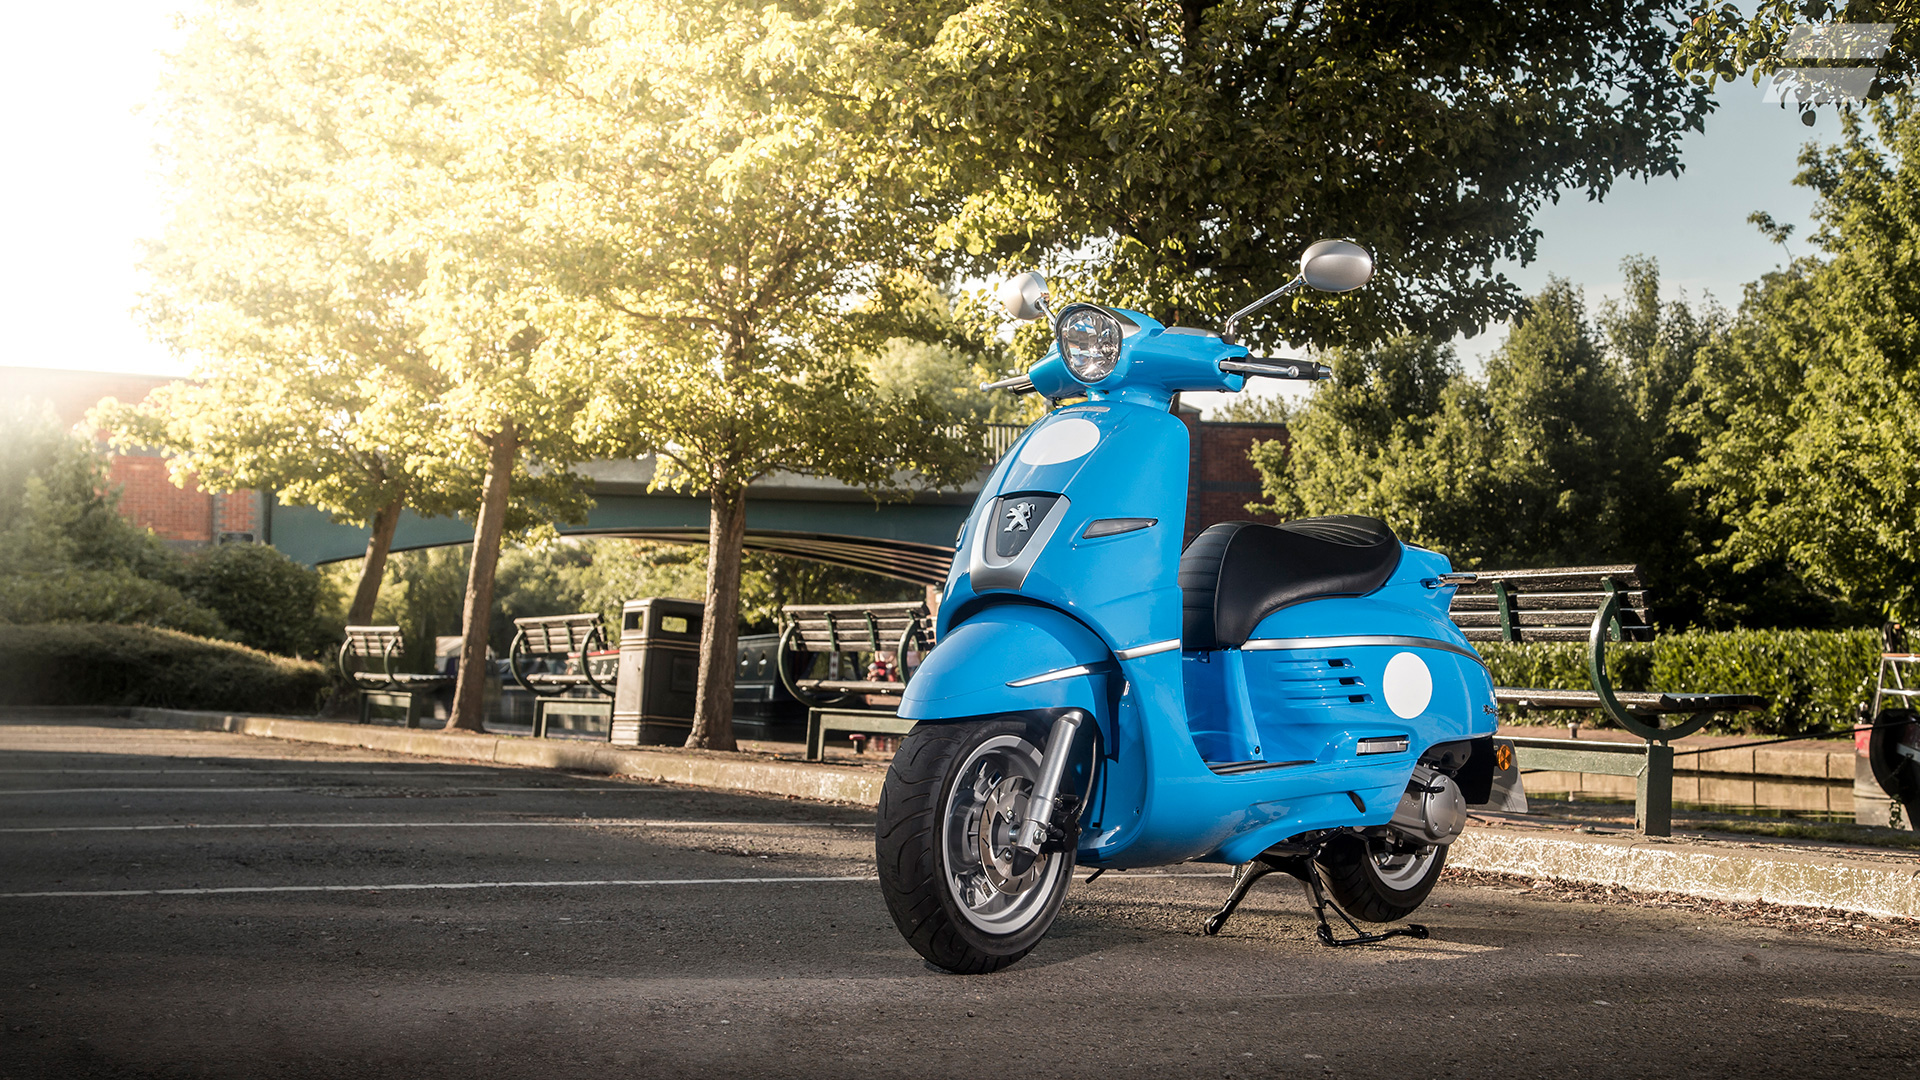 Peugeot Django Bikes For Sale Autotrader Bikes